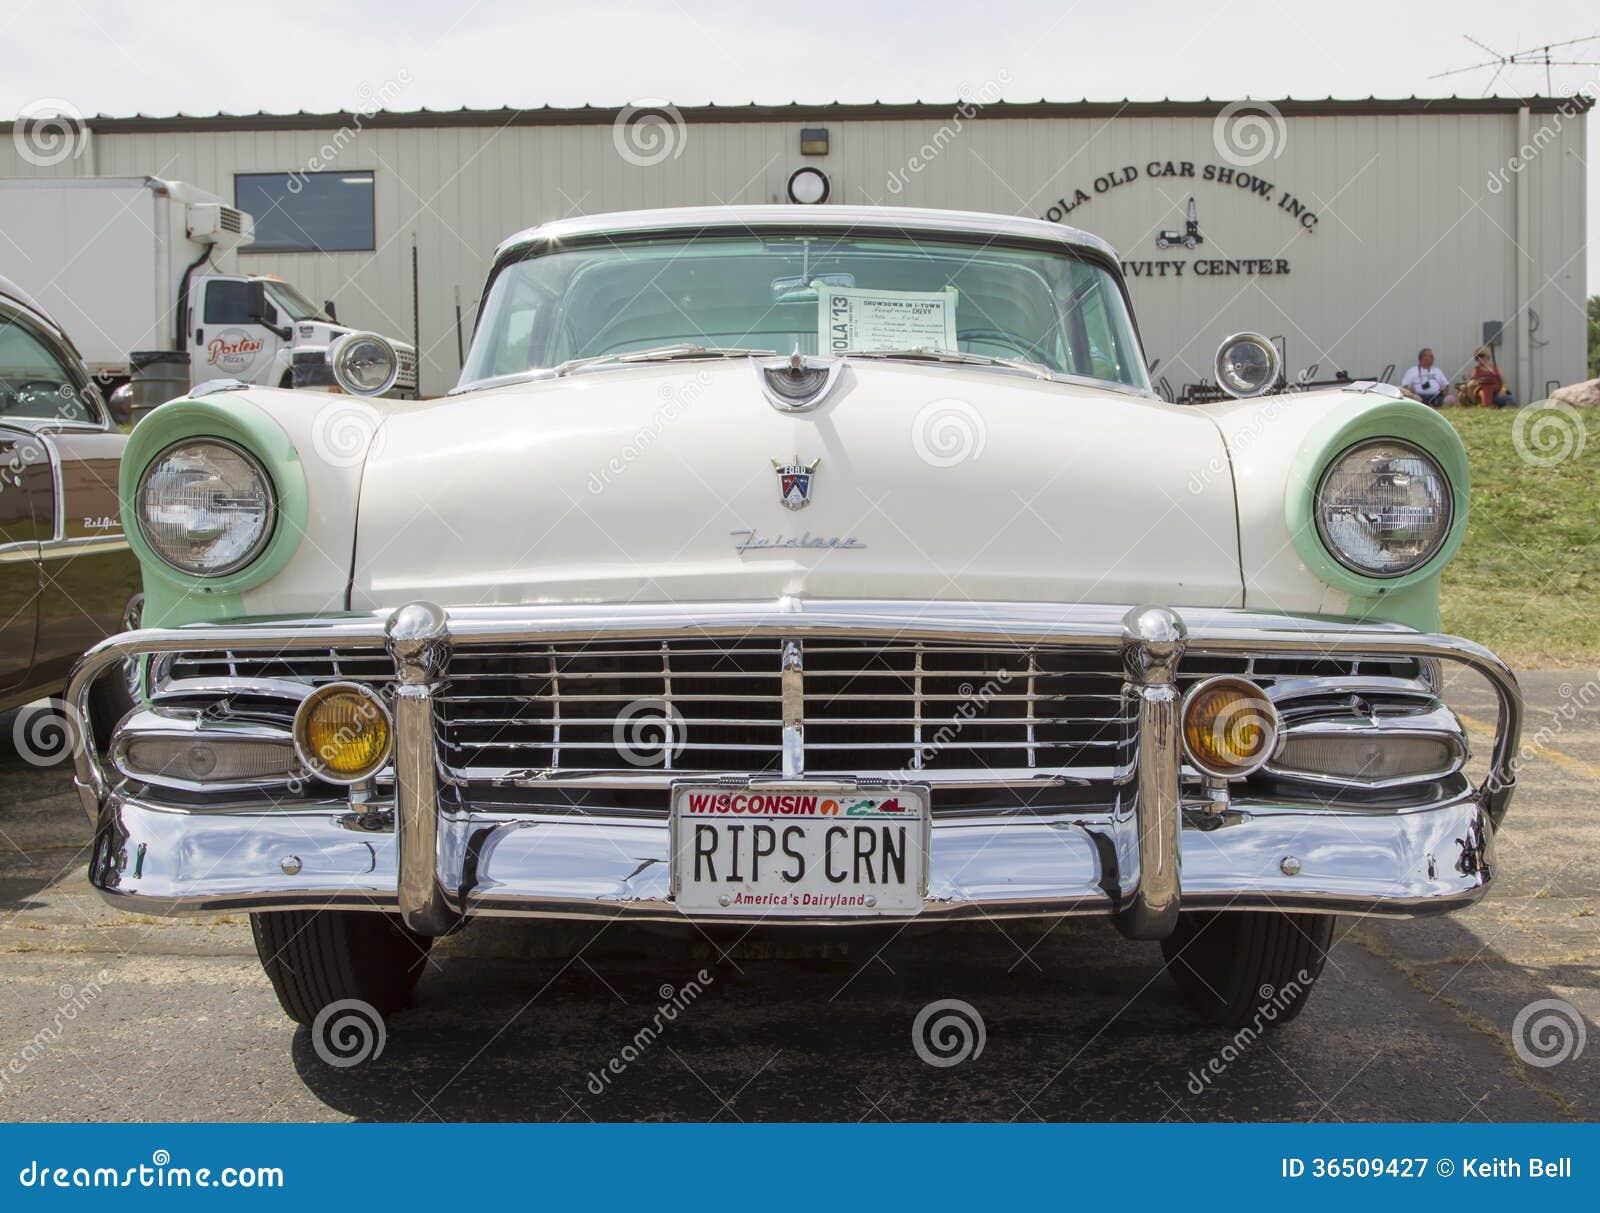 Ford Fairlane Crown Victoria Green vit främre sikt 1956